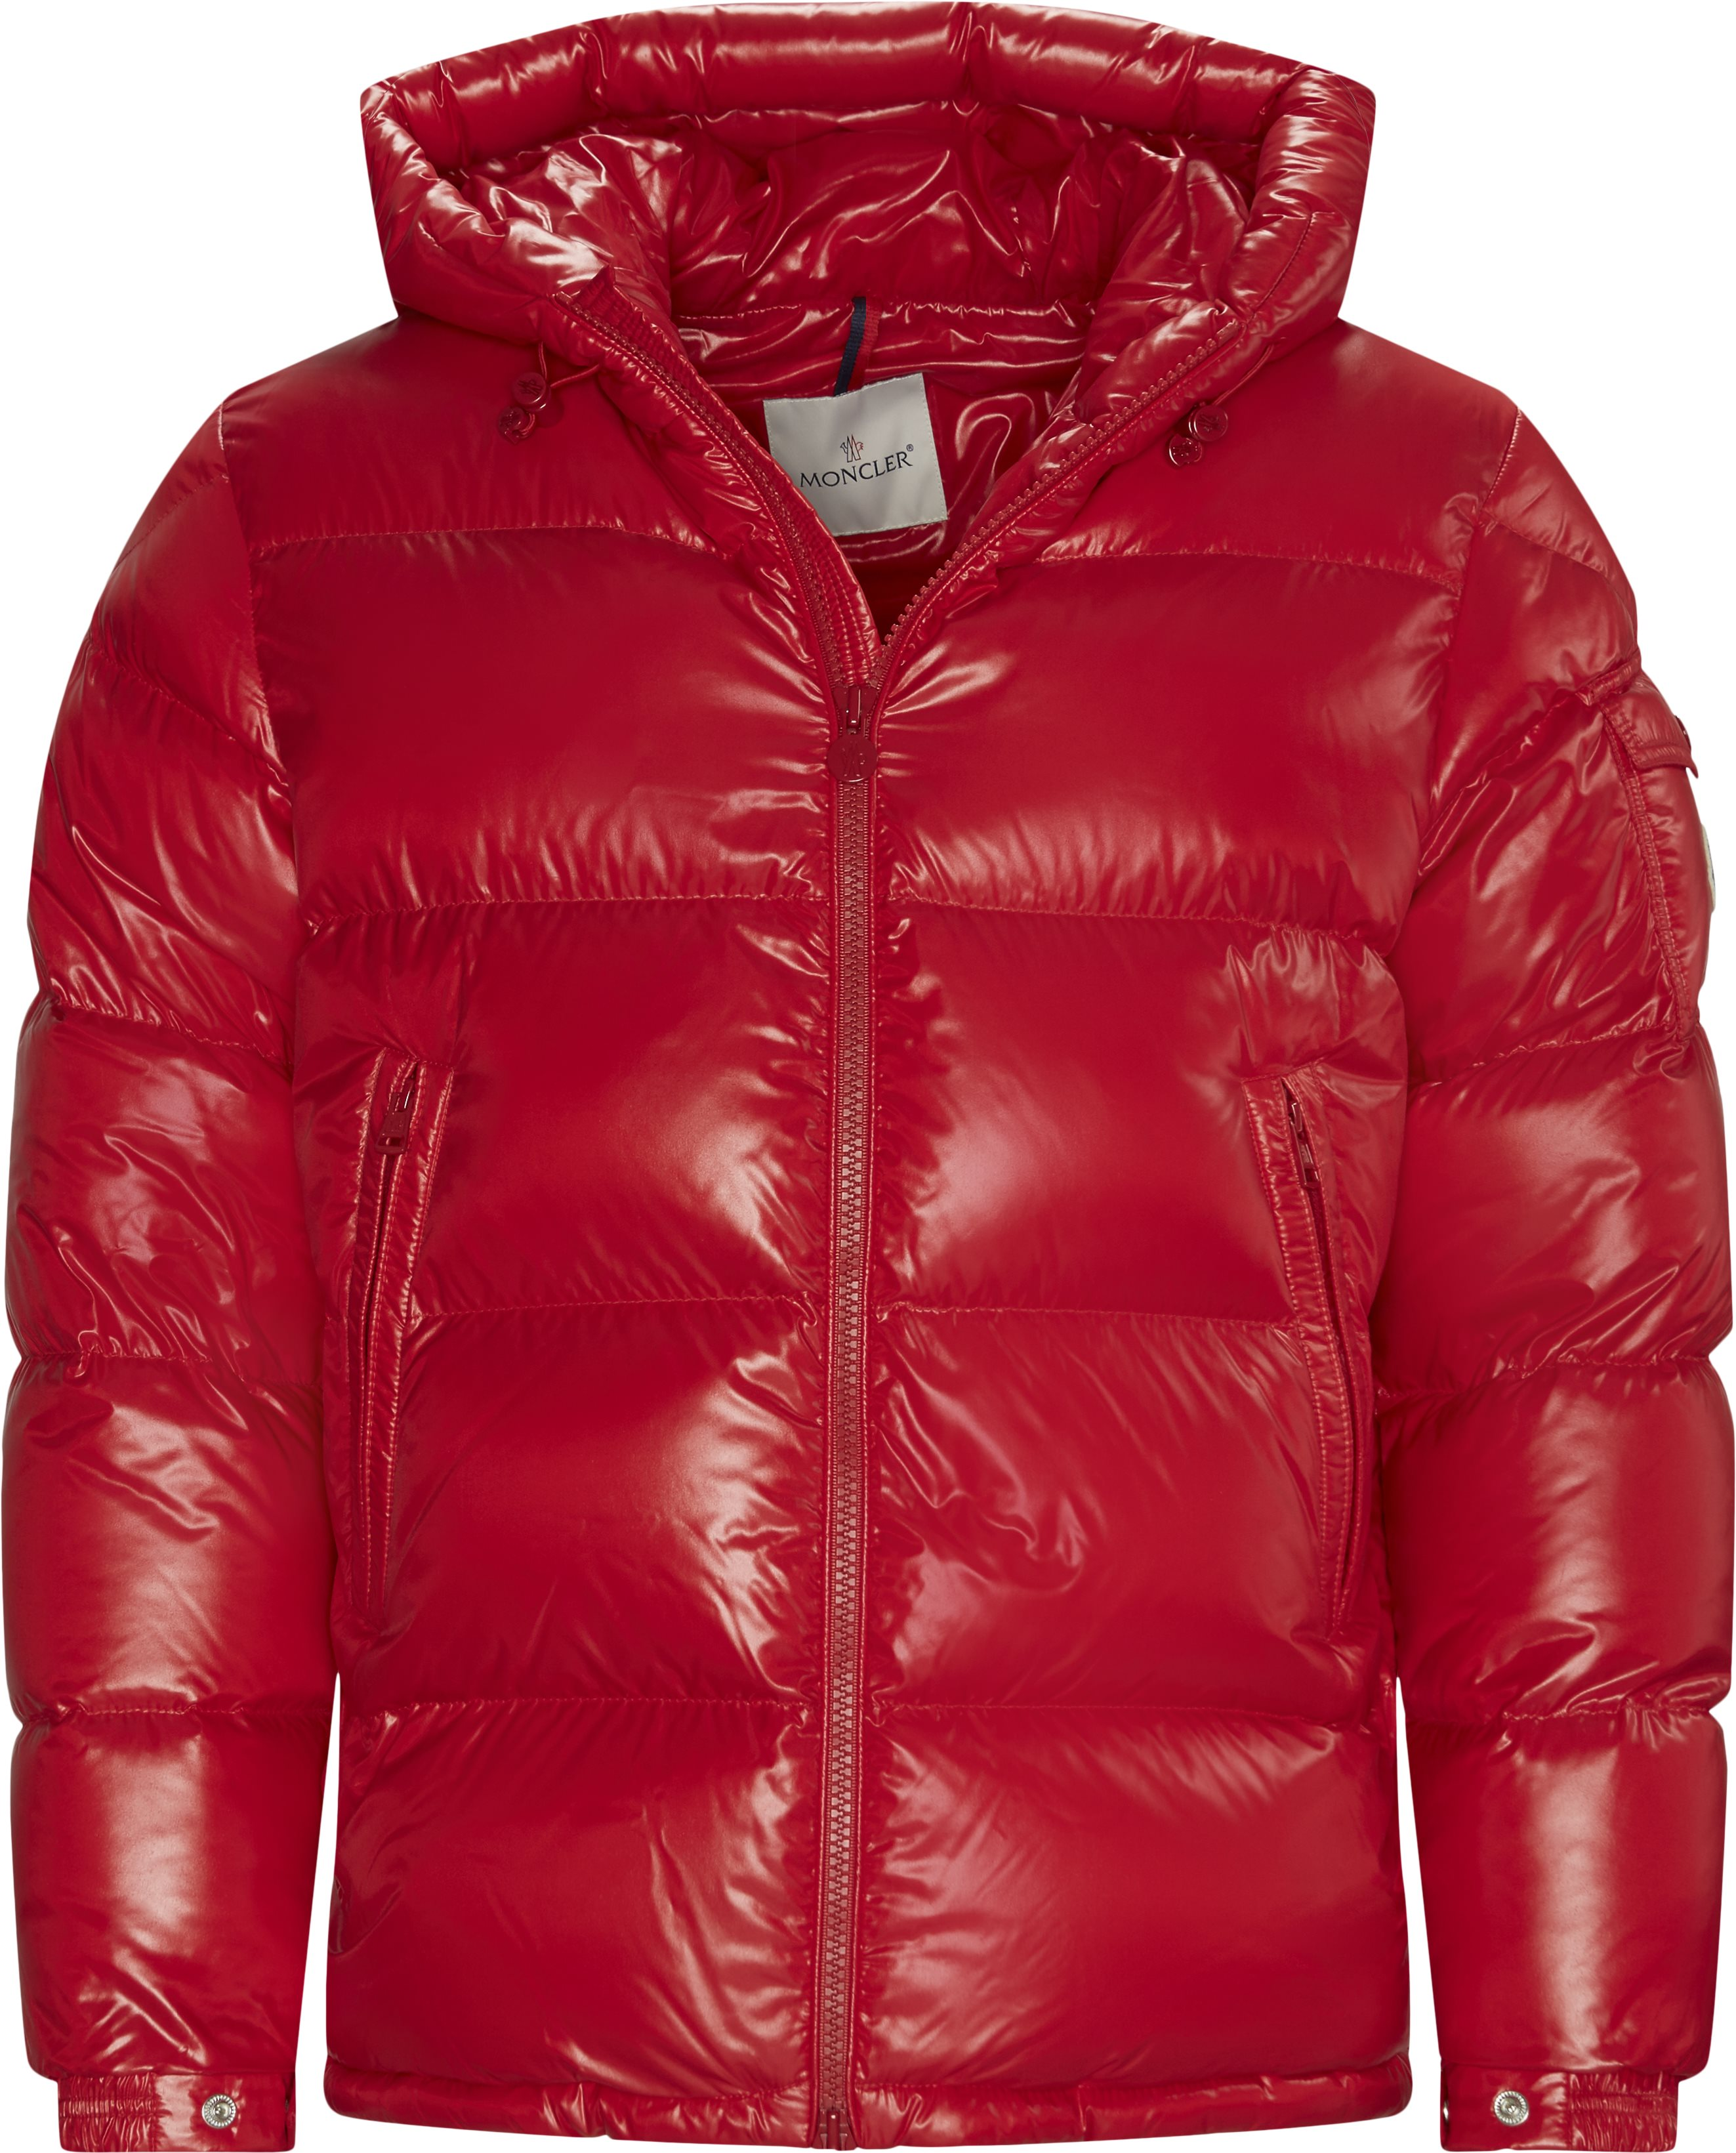 Jackets - Regular fit - Red